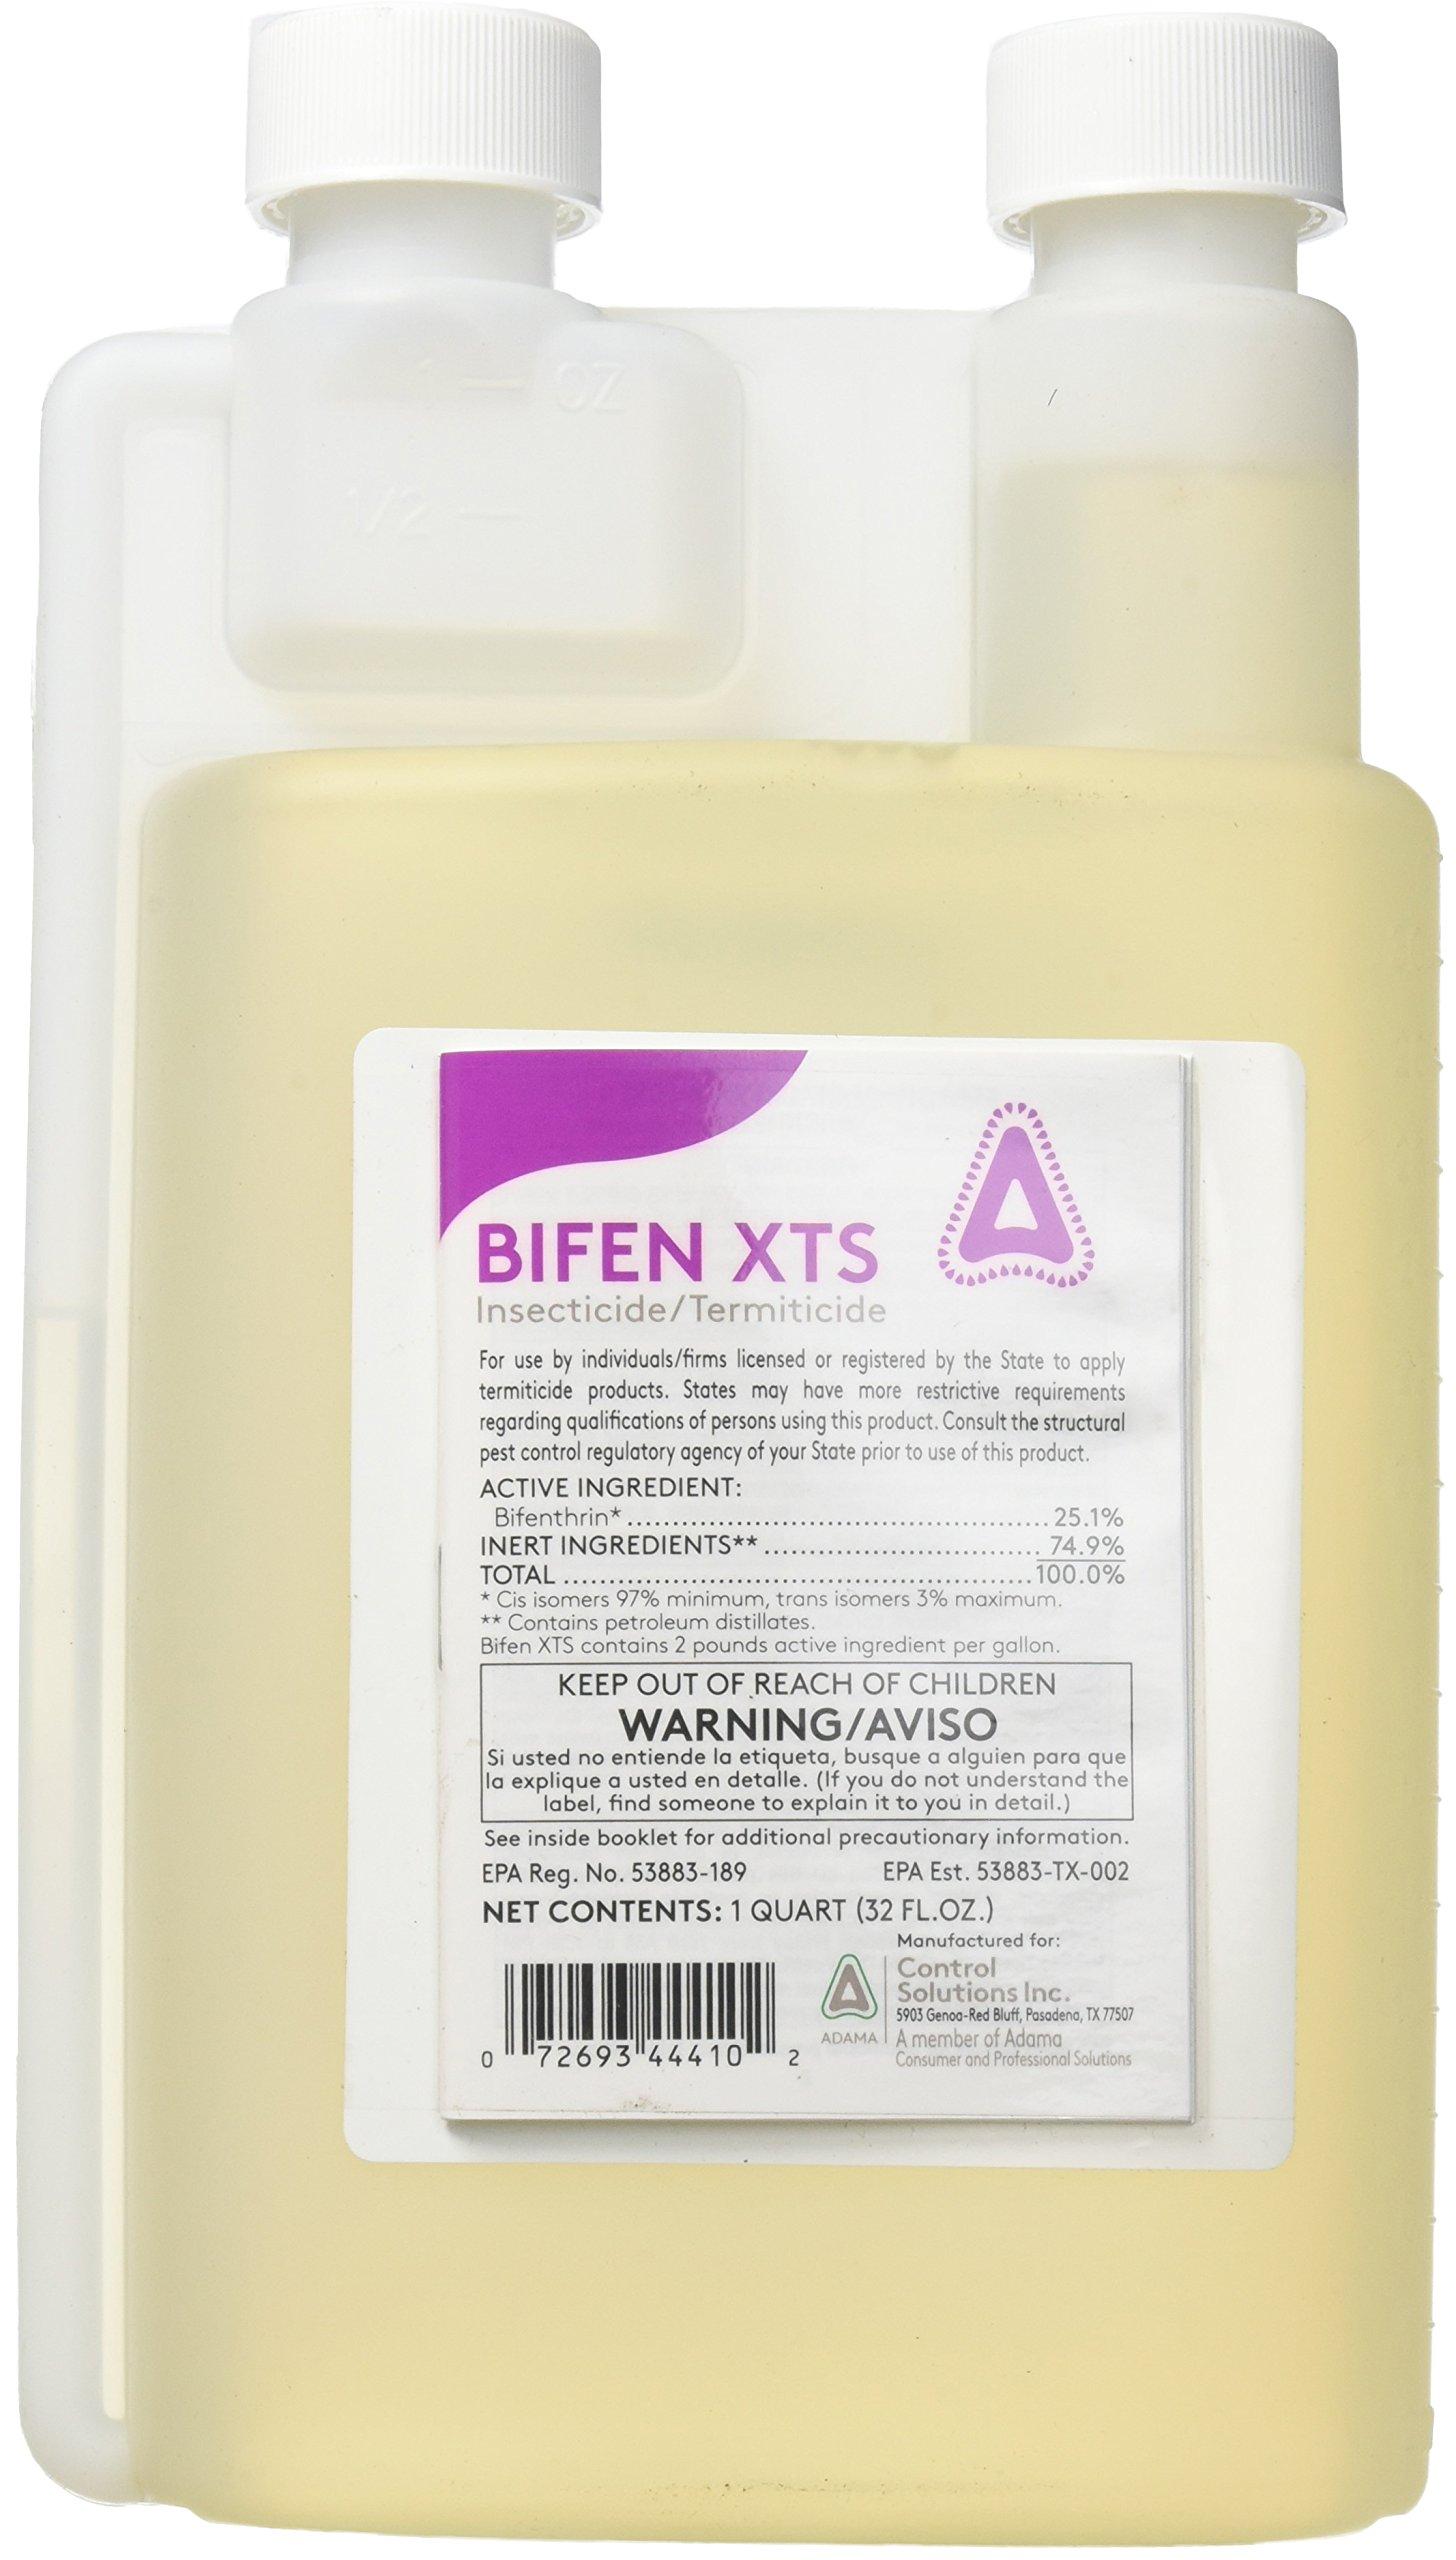 Bifen XTS 25.1% 32 oz quart